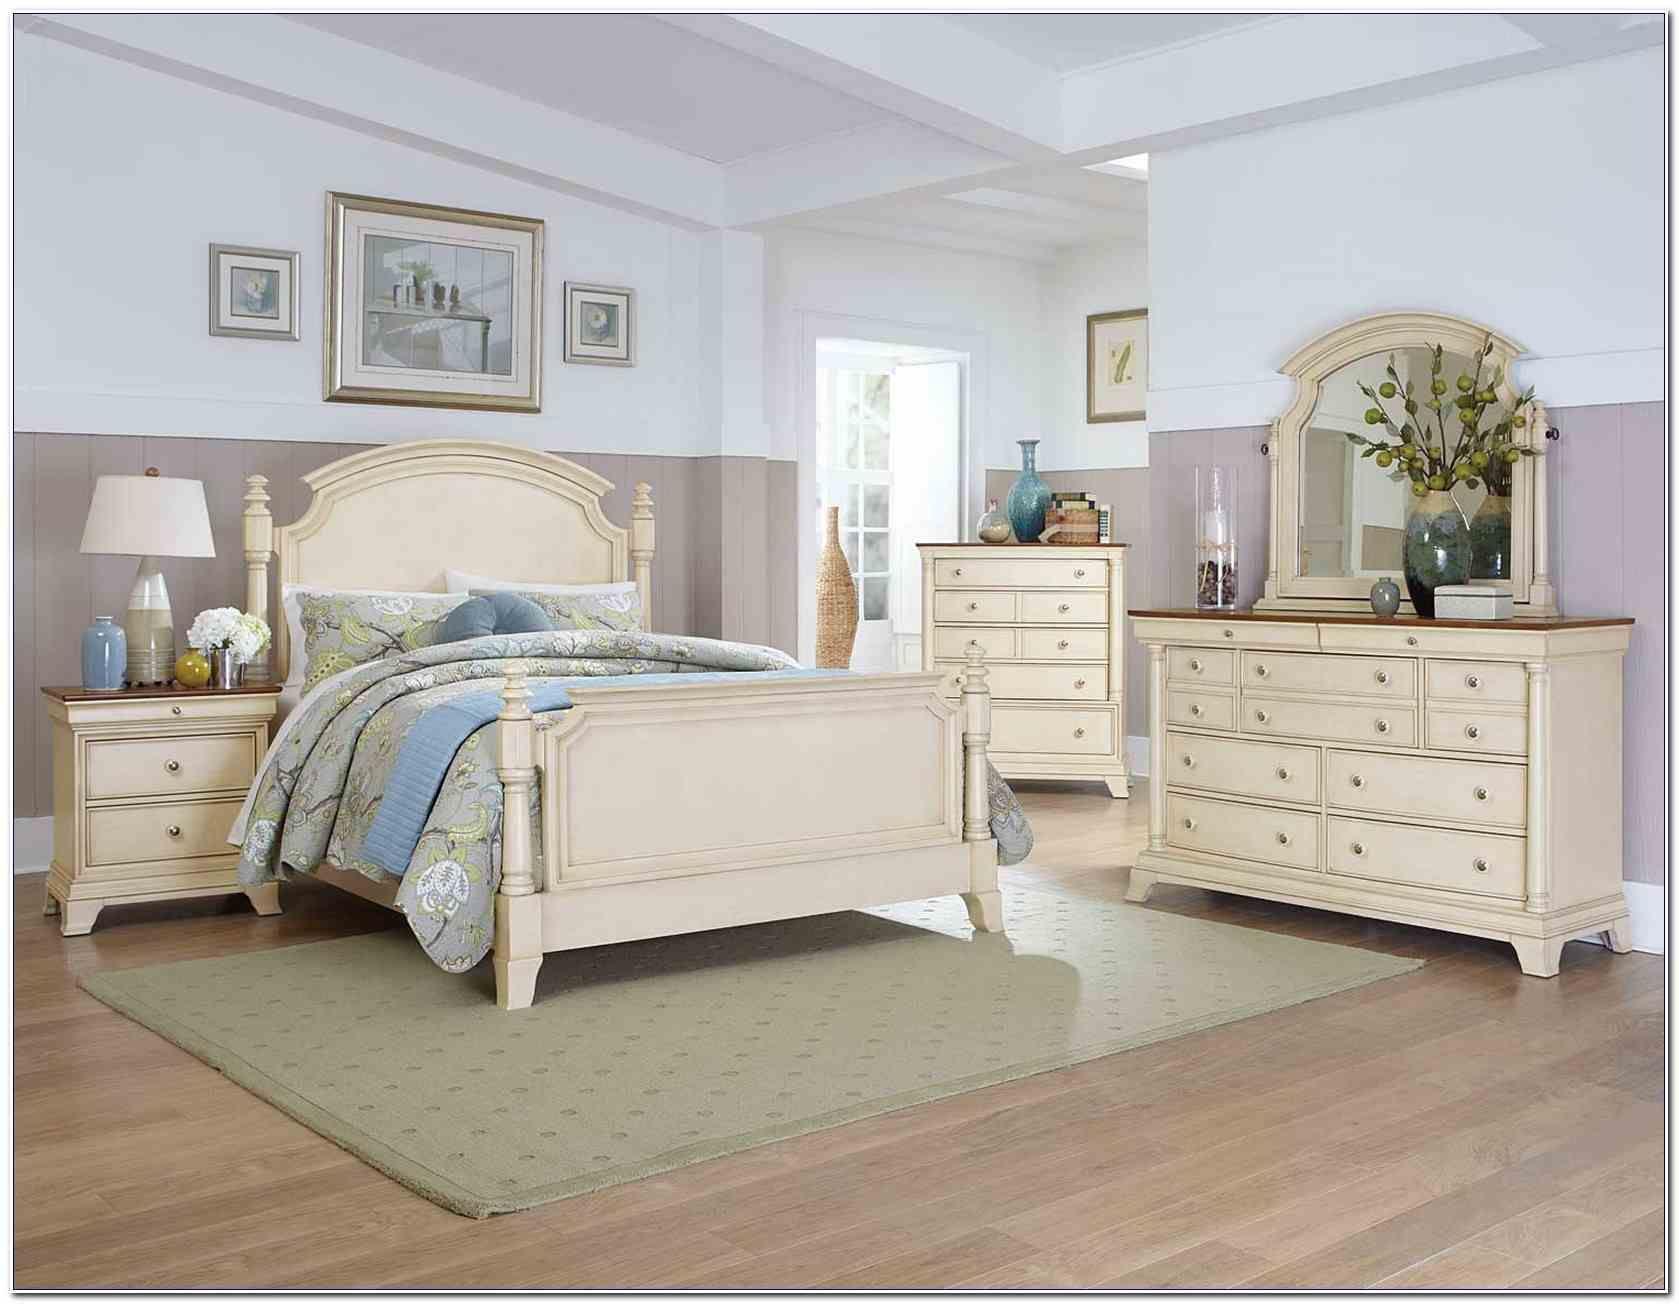 Cream Colored Bedroom Furniture Sets Cream Bedroom Furniture